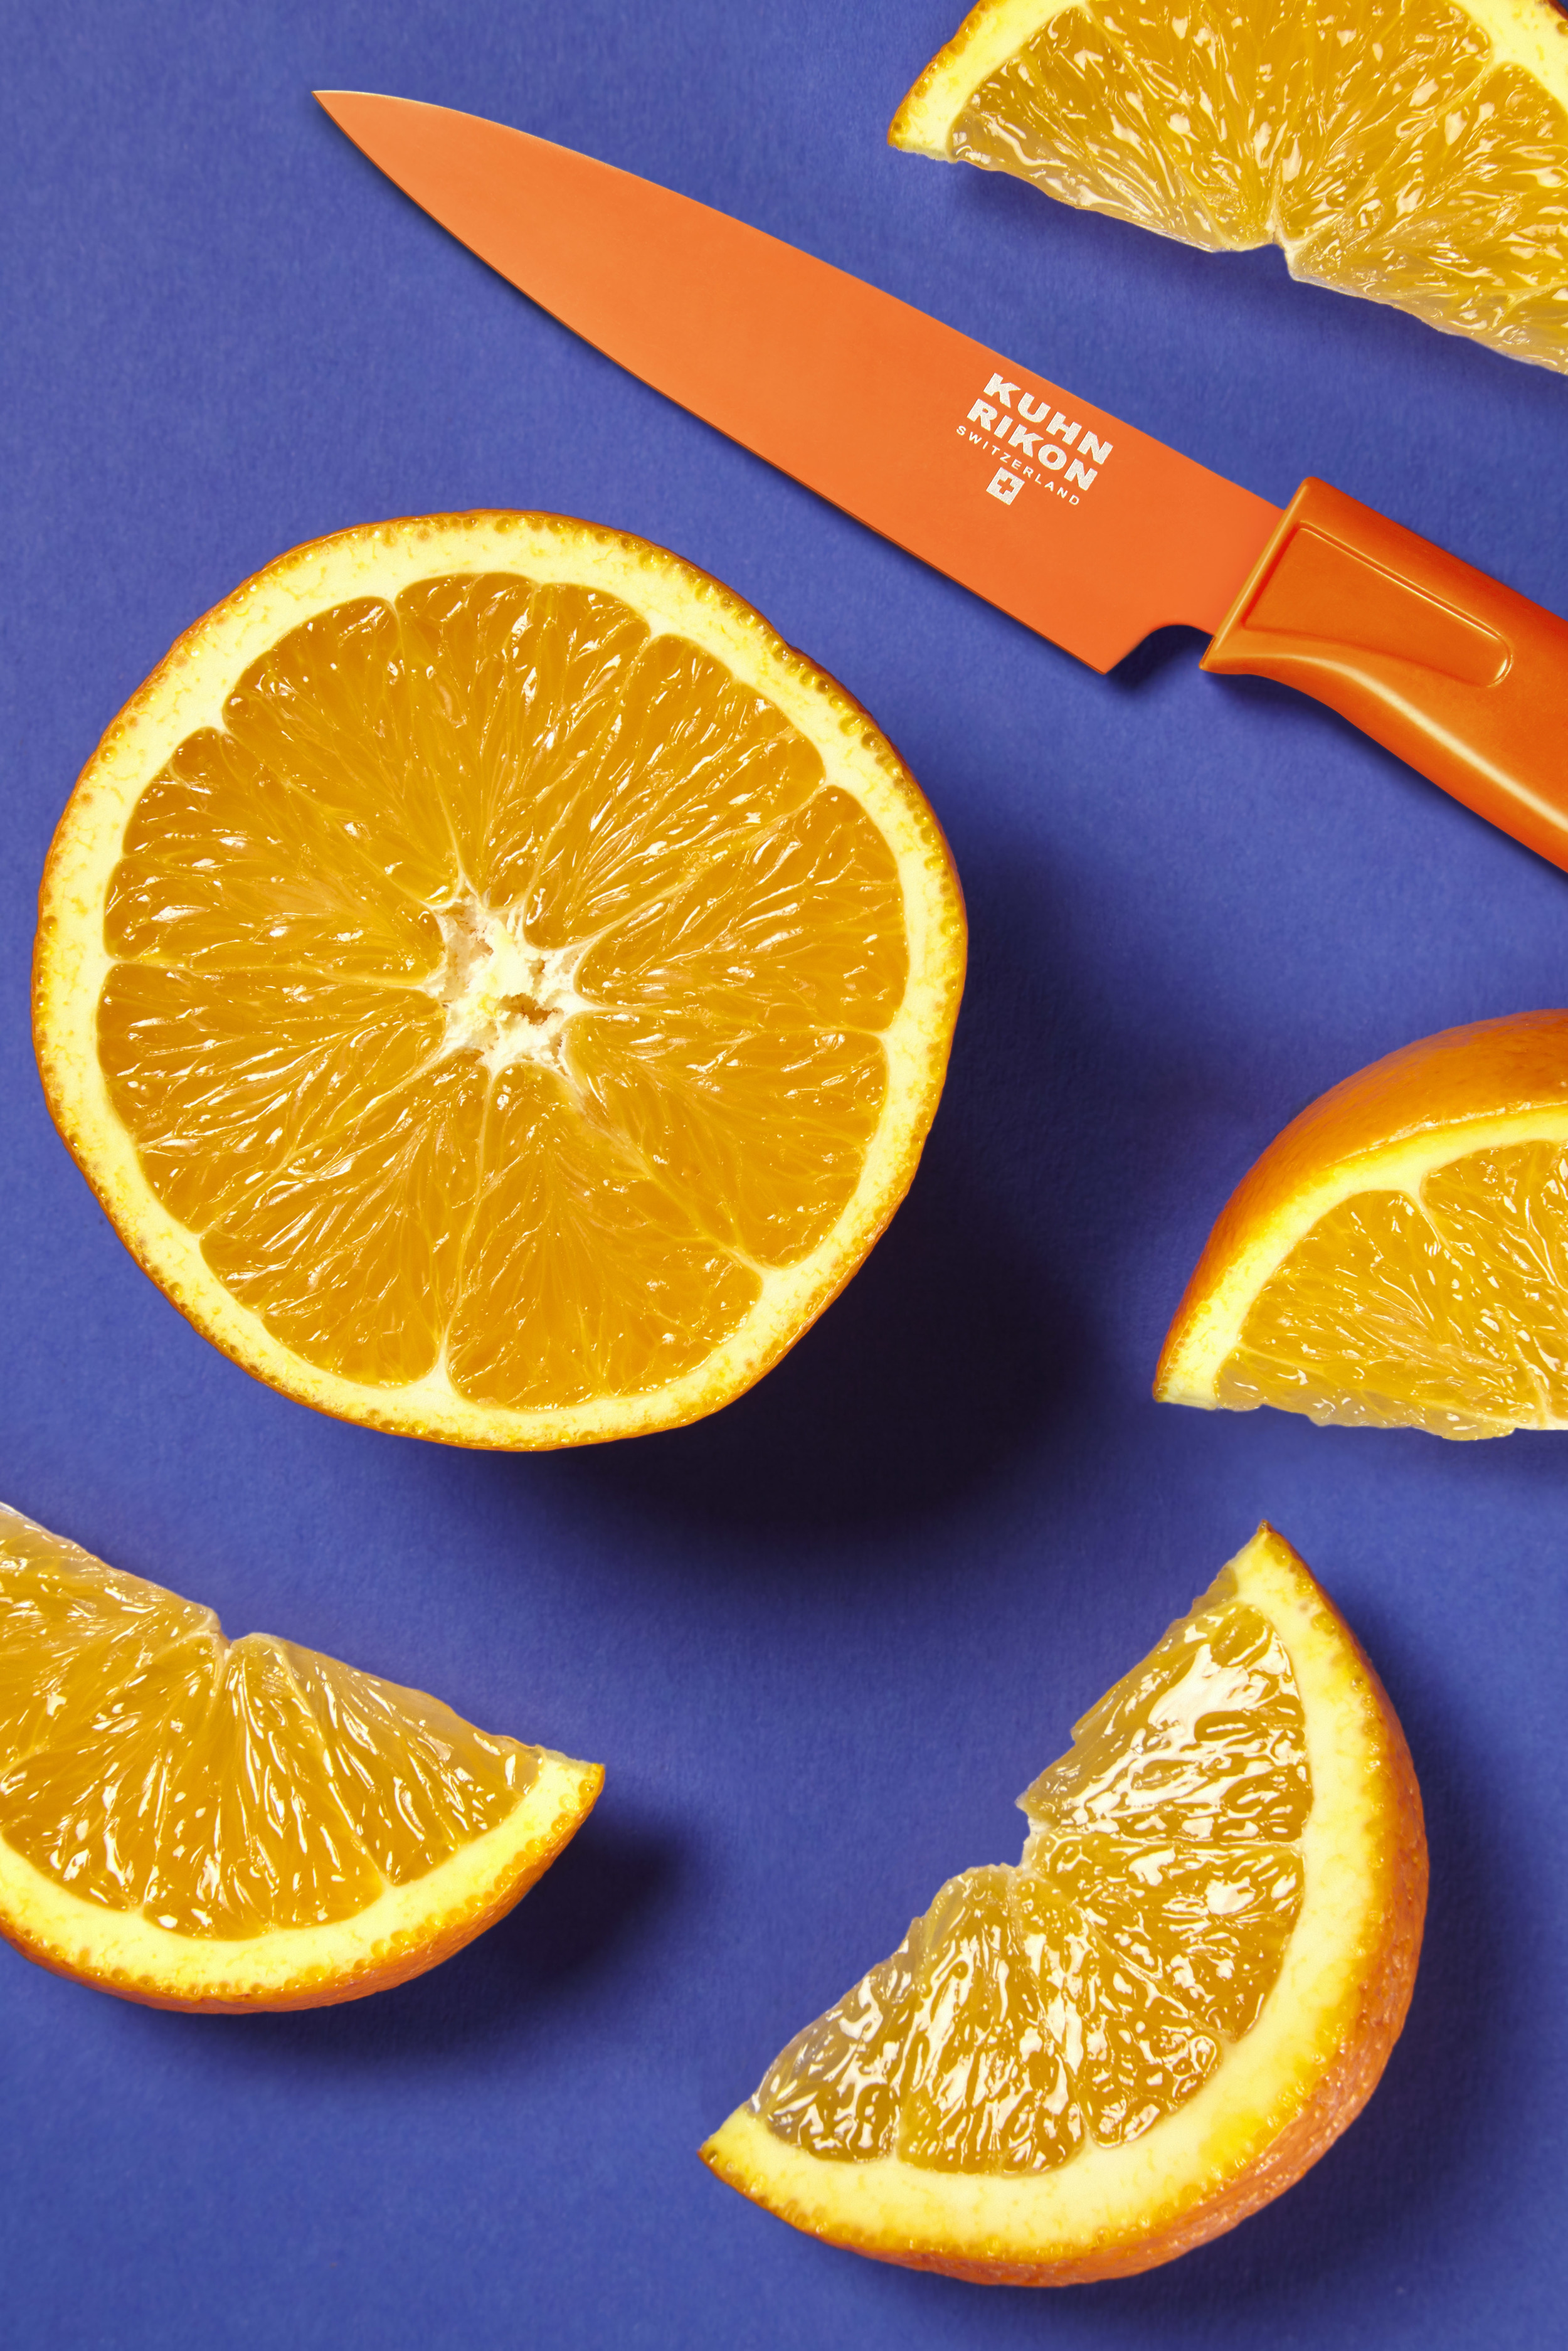 Oranges_COMP.jpg